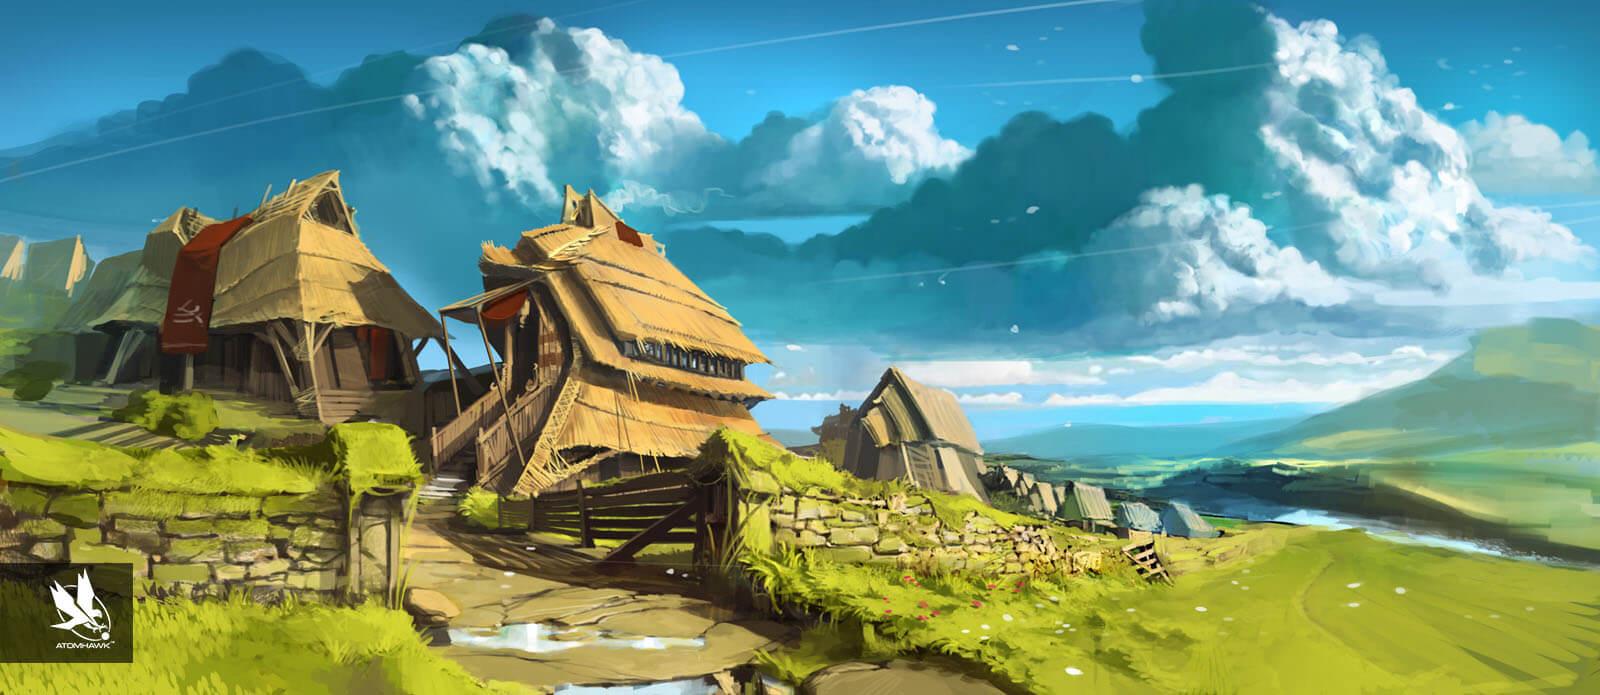 Atomhawk Village Environment Design for The Realm